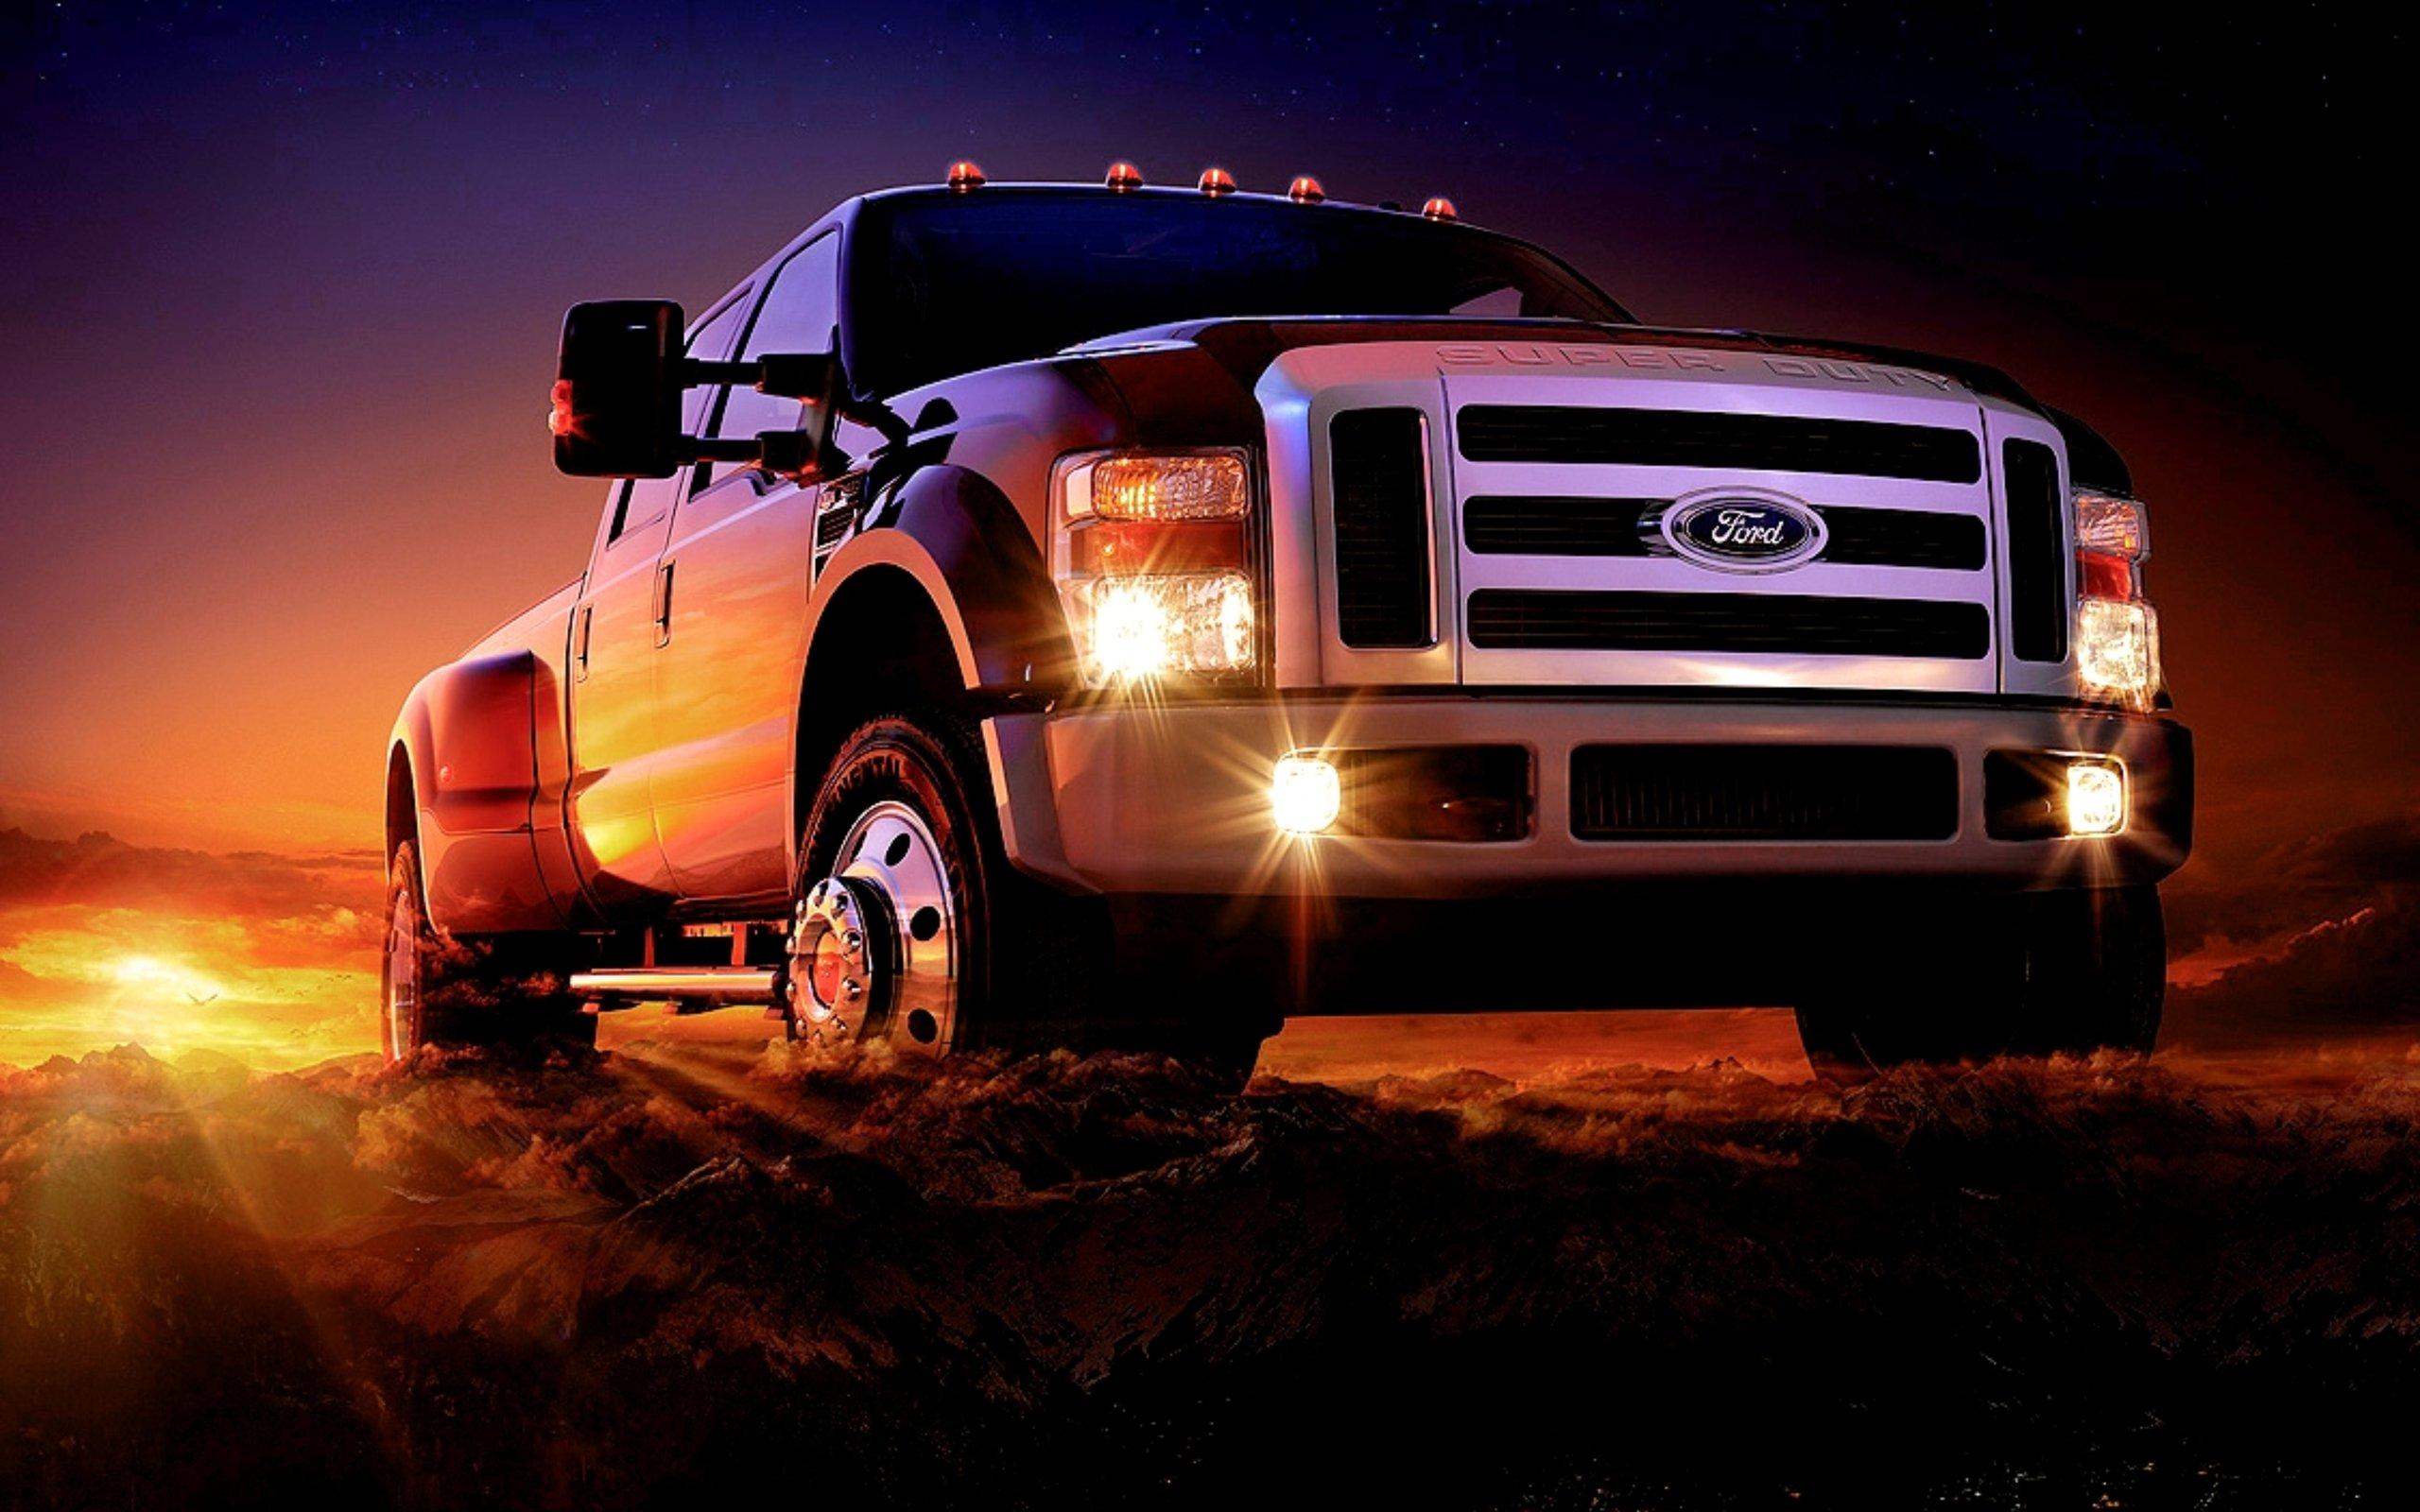 Ford Pick Up Wallpaper HD 9756 Wallpaper WallpaperLepi 2560x1600